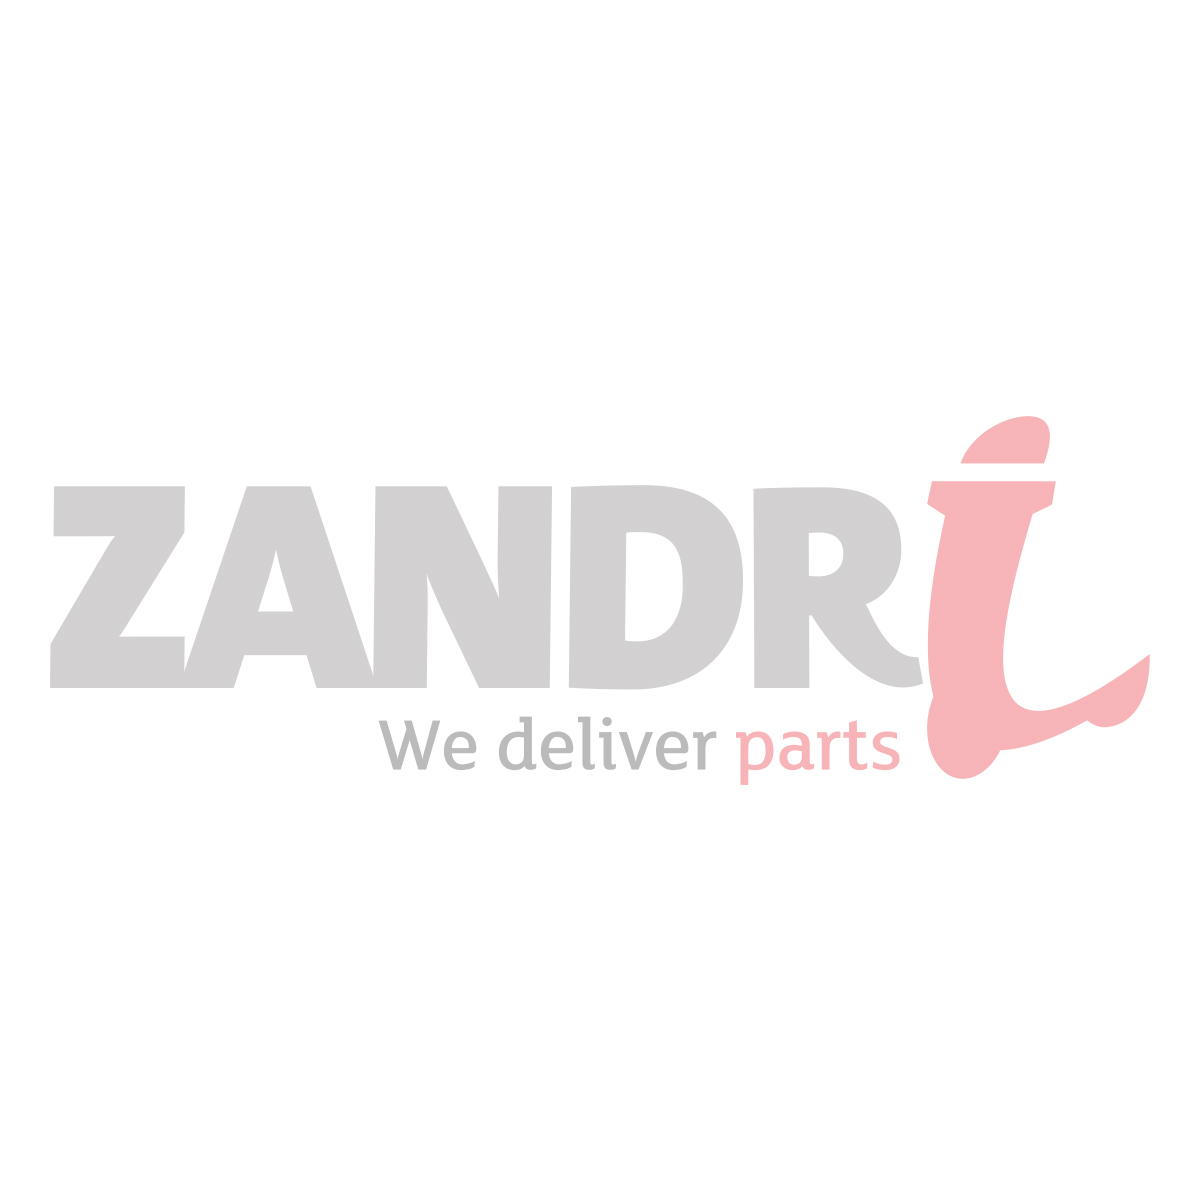 Buddy / Zadelslot Vergrendelingsnok China scooter Vx50 / Lx / Napoli